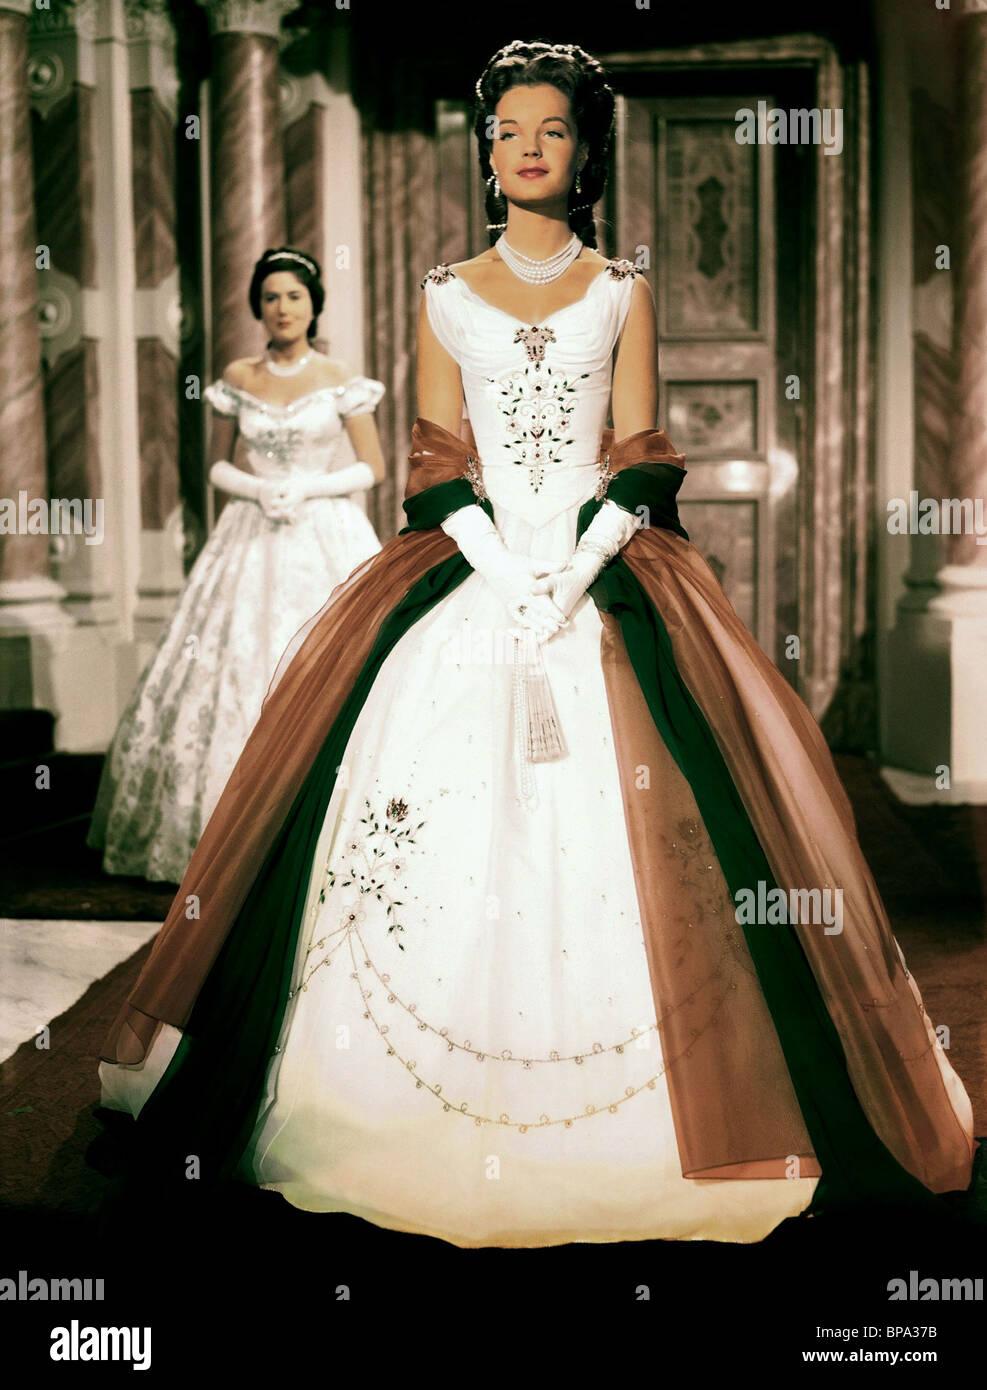 Sissi Romy Schneider 1955 Stock Photos Sissi Romy Schneider 1955